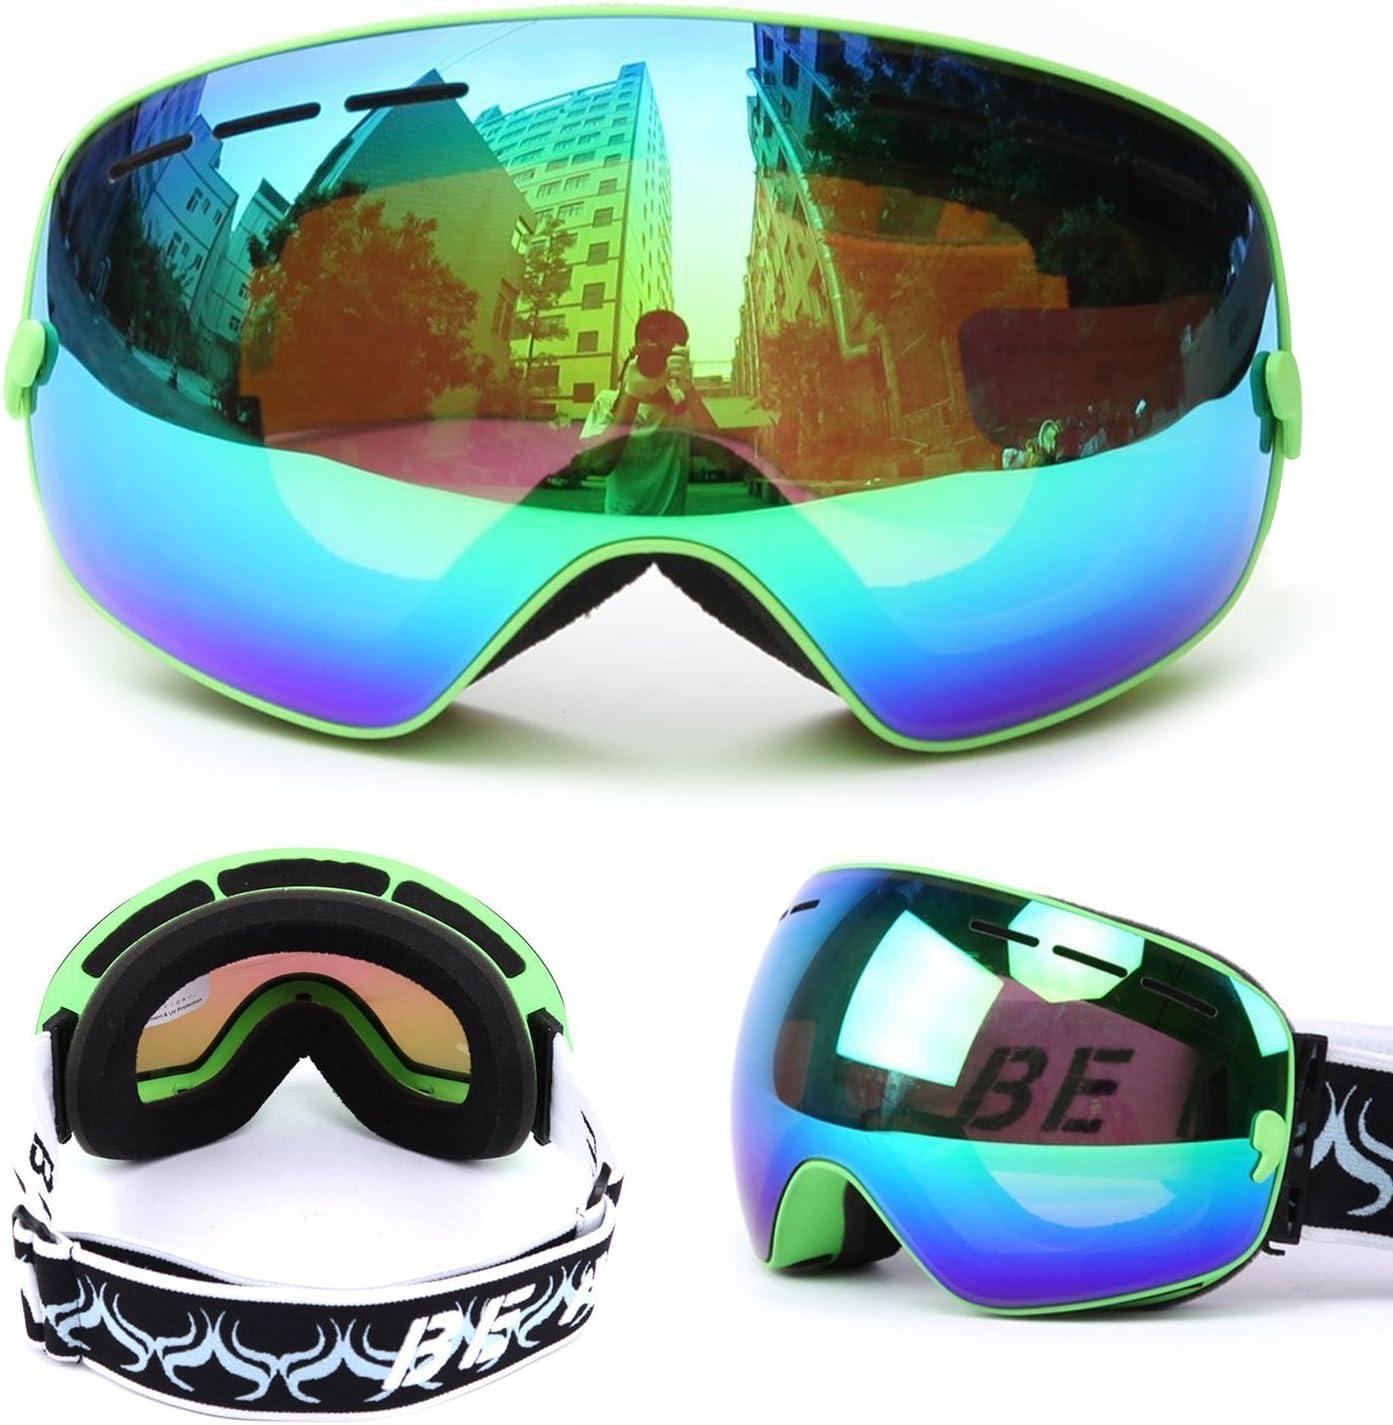 Ski Goggles,Mens Womens Snow Snowboard Snowboarding Goggles Double Lens Big Spherical Over Glasses Anti Fog UV Protection Non-Slip Strap OTG Goggles for Snowboard, Skiing or Snowmobile